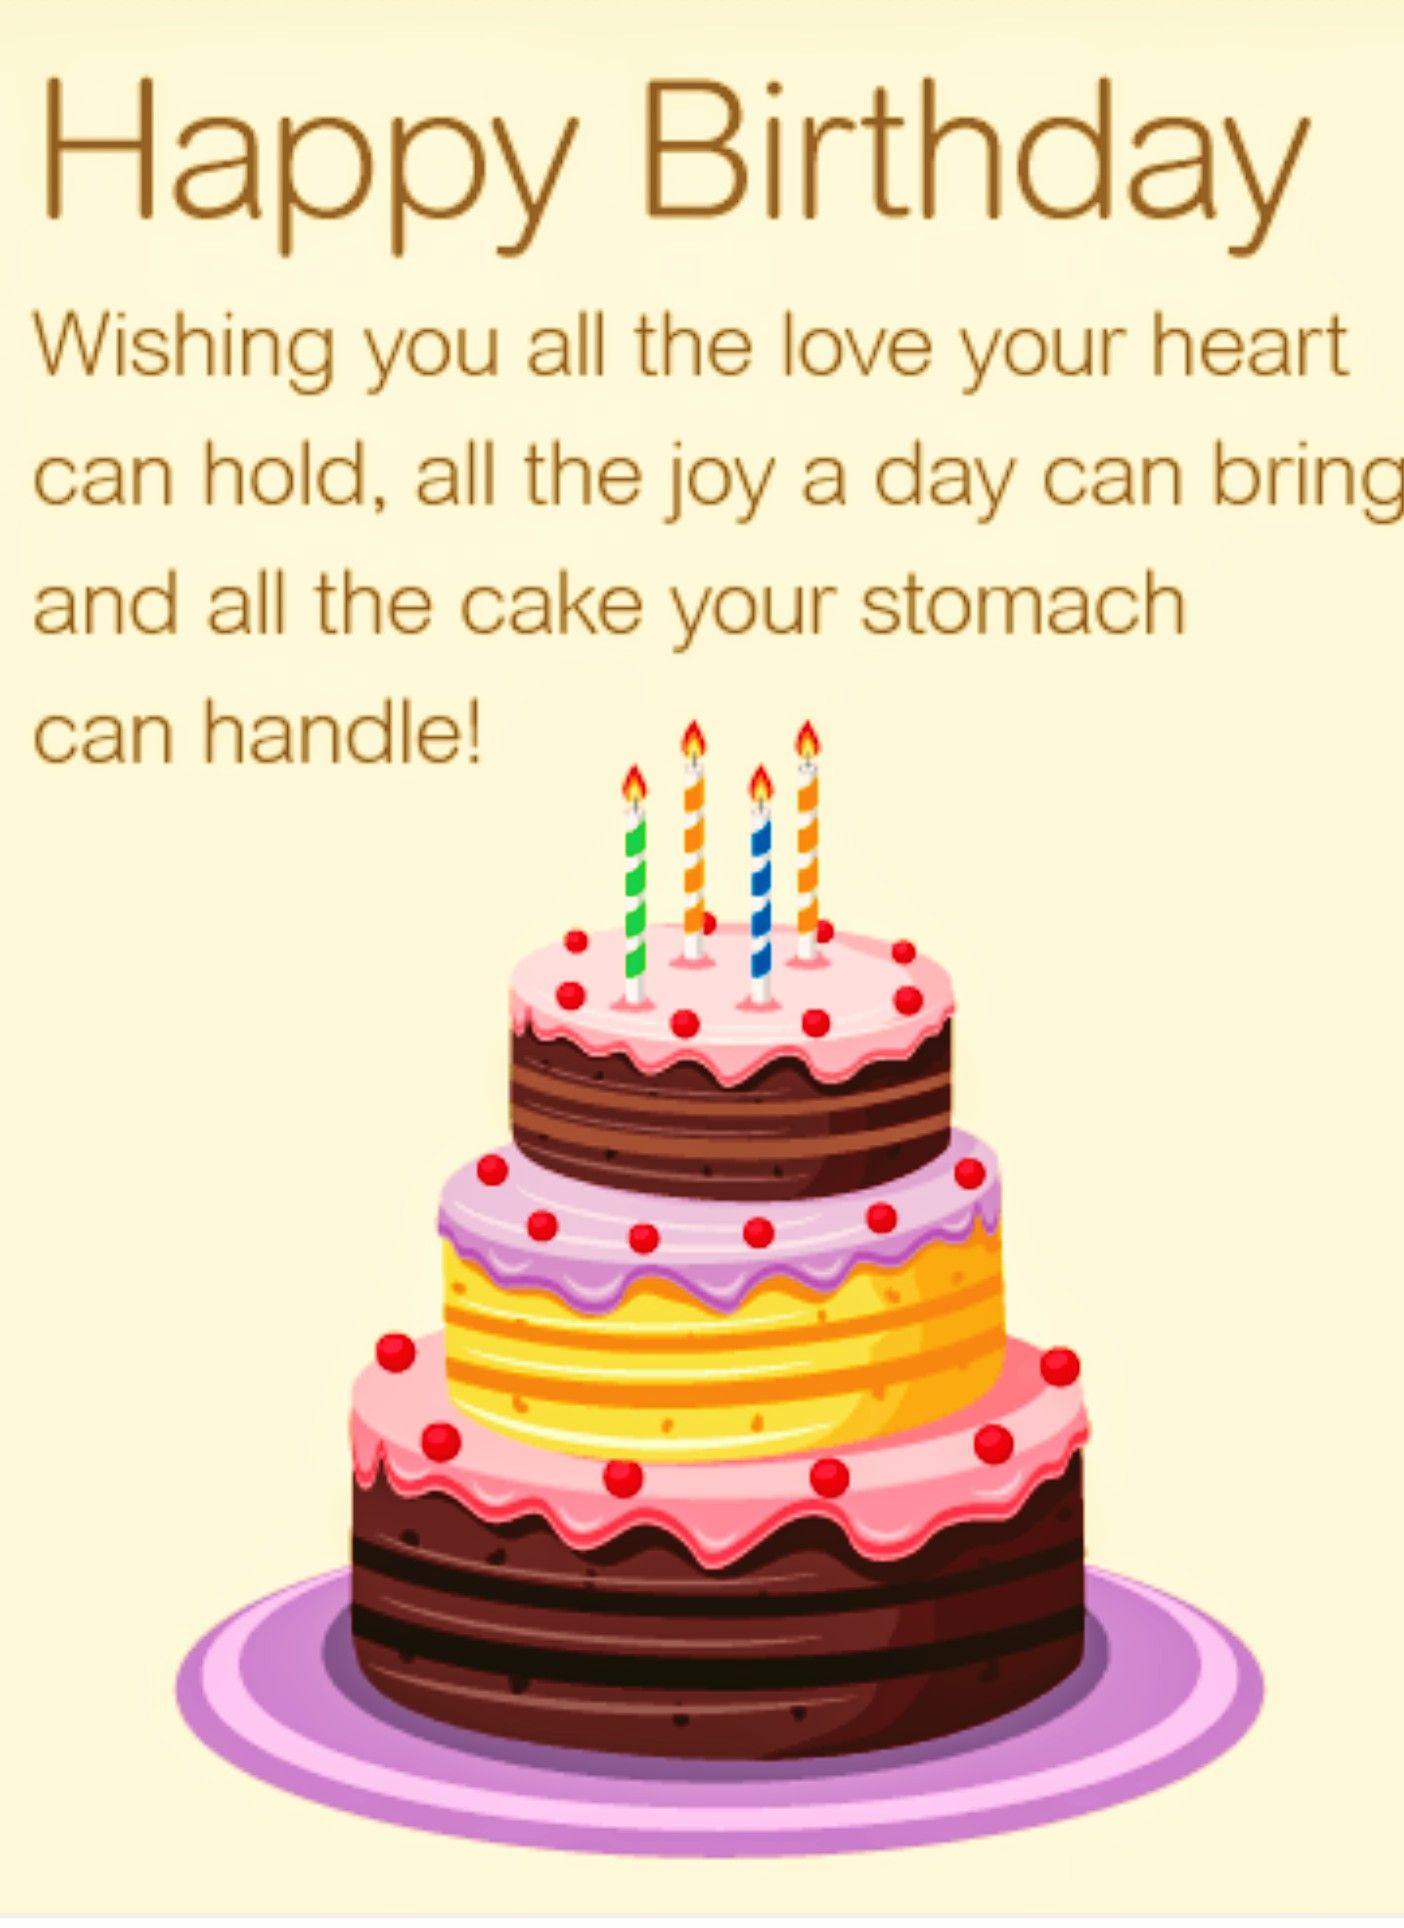 Pin by L L on Birthday Birthday wishes girl, Birthday